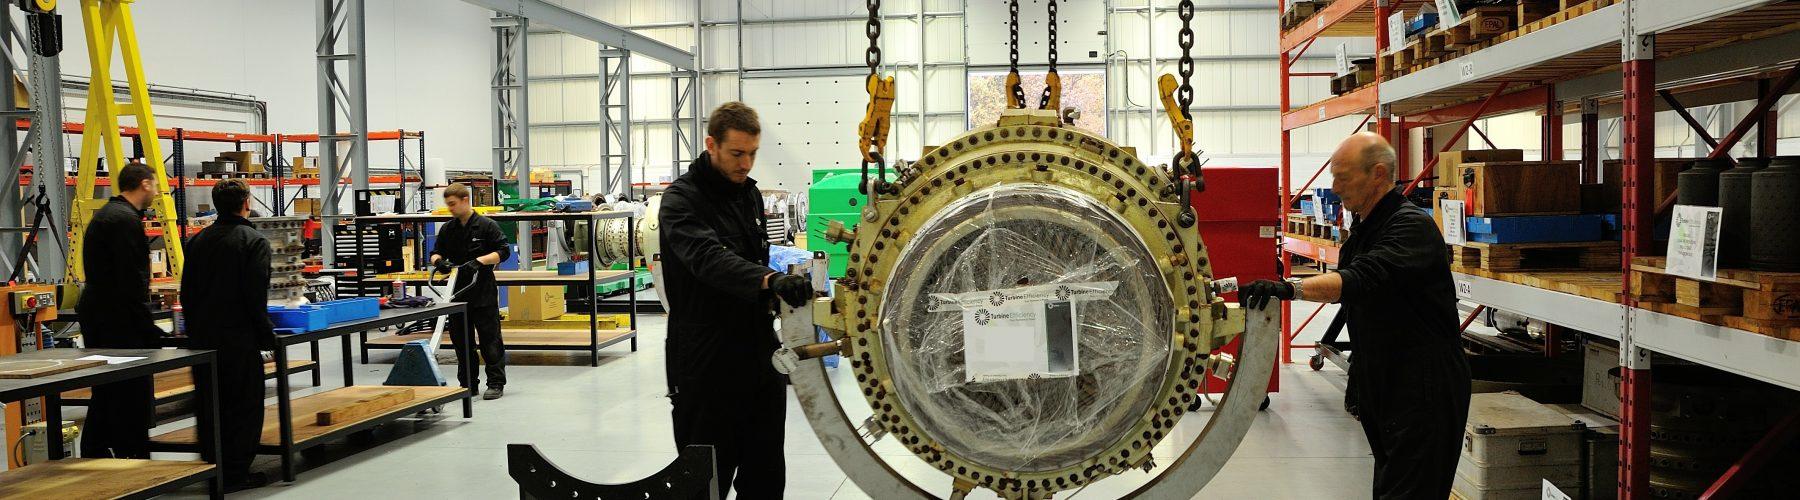 Turbine Efficiency Ltd